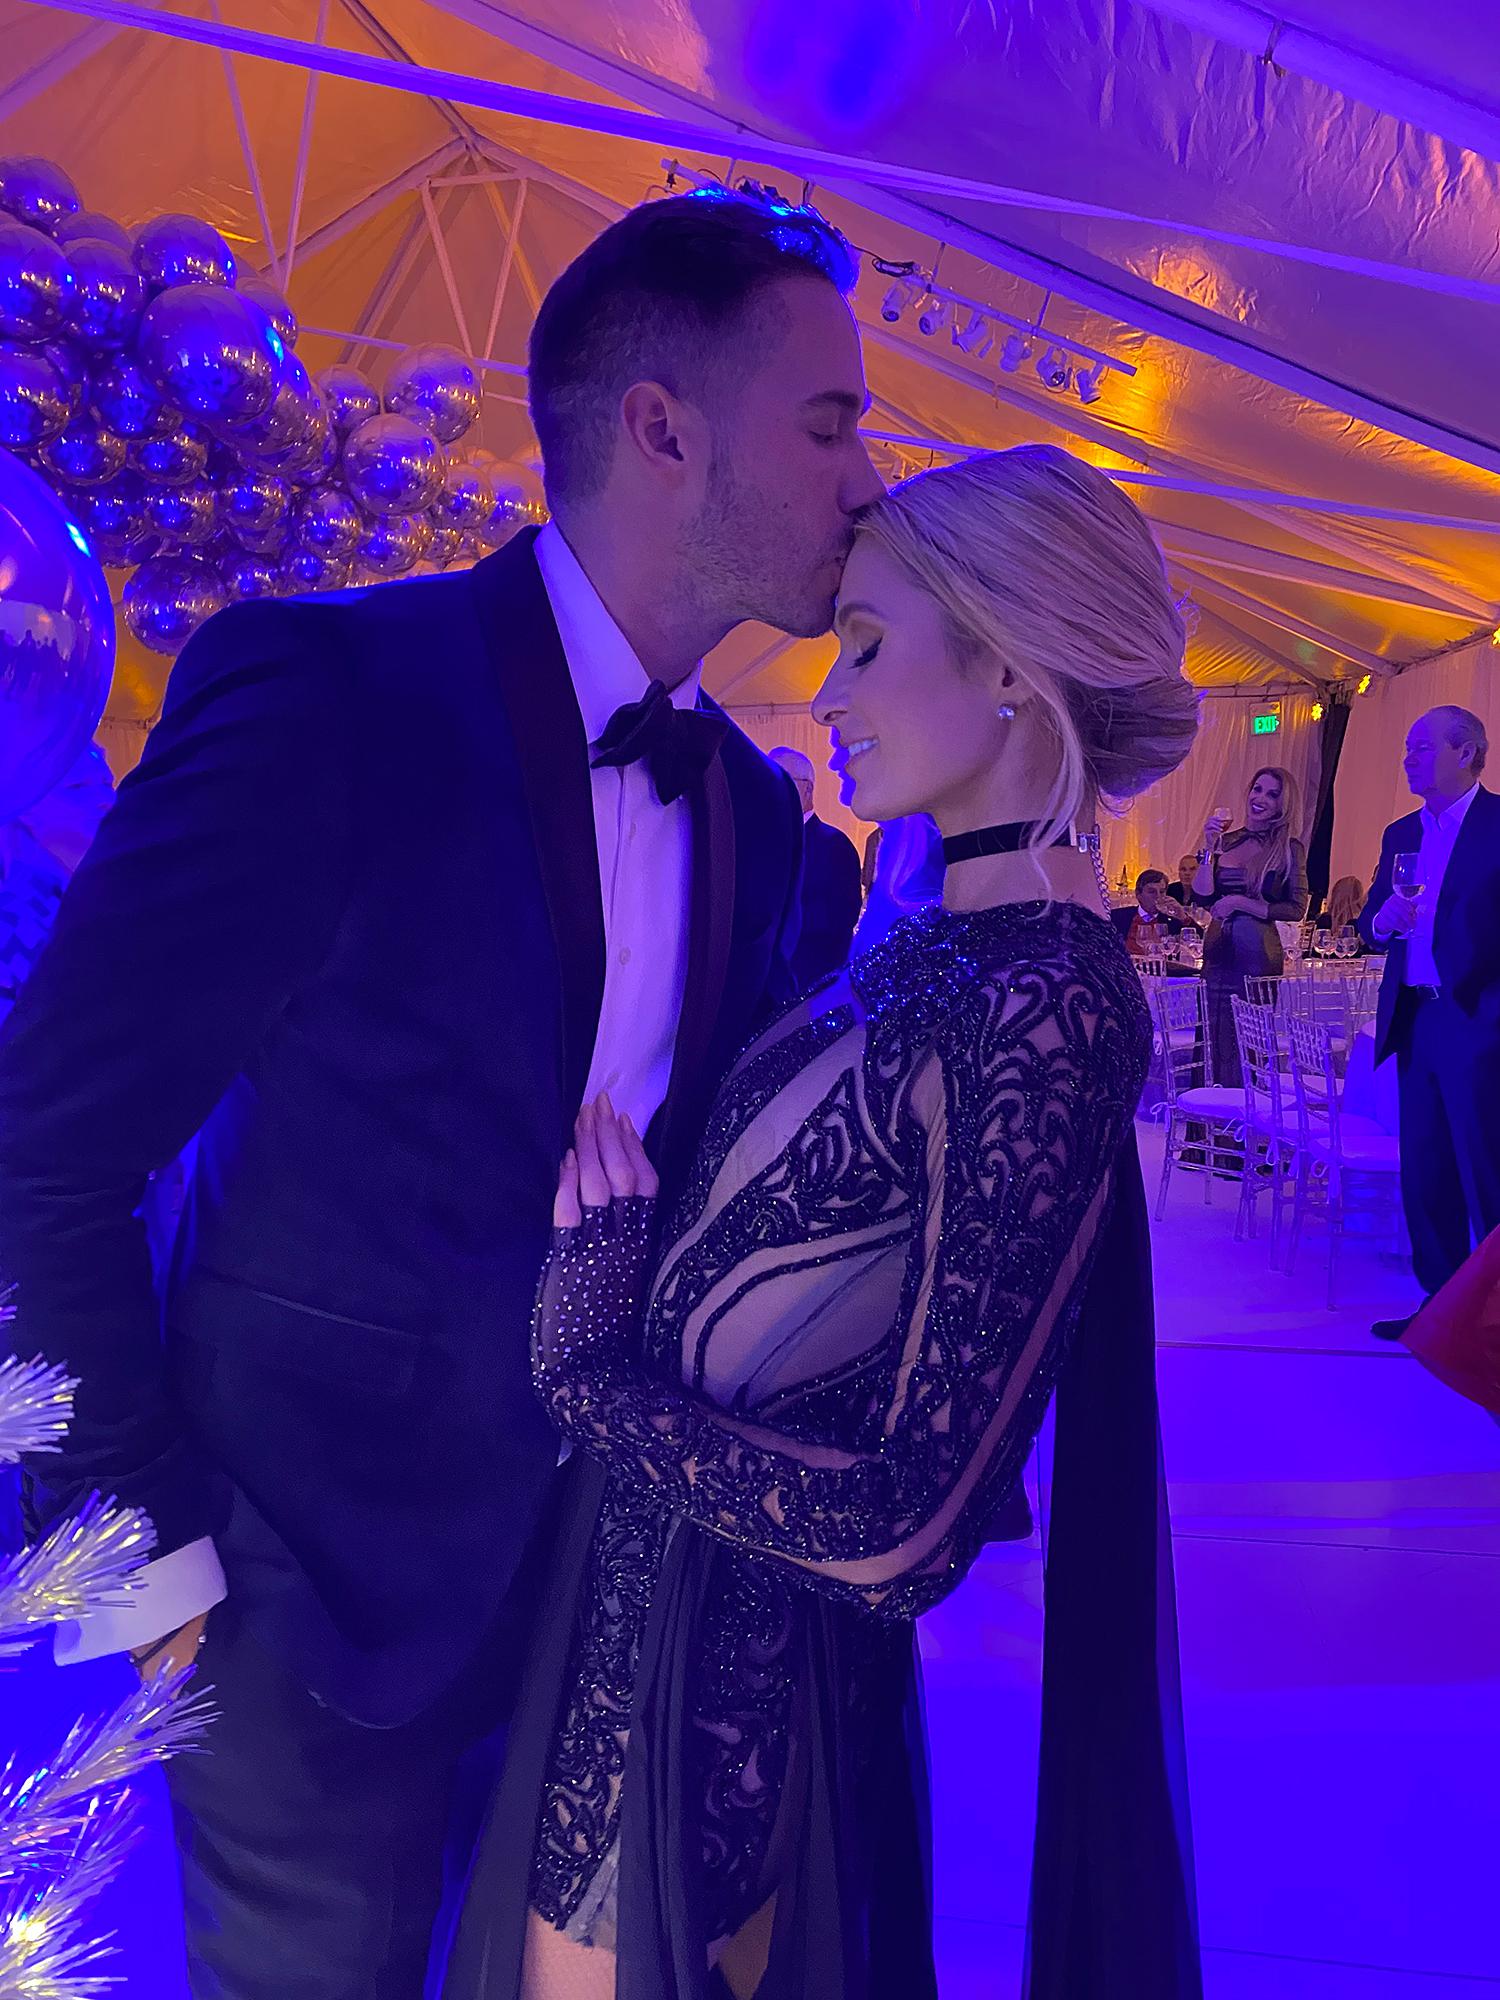 Paris Hilton Celebrates Anniversary With BF Carter Reum